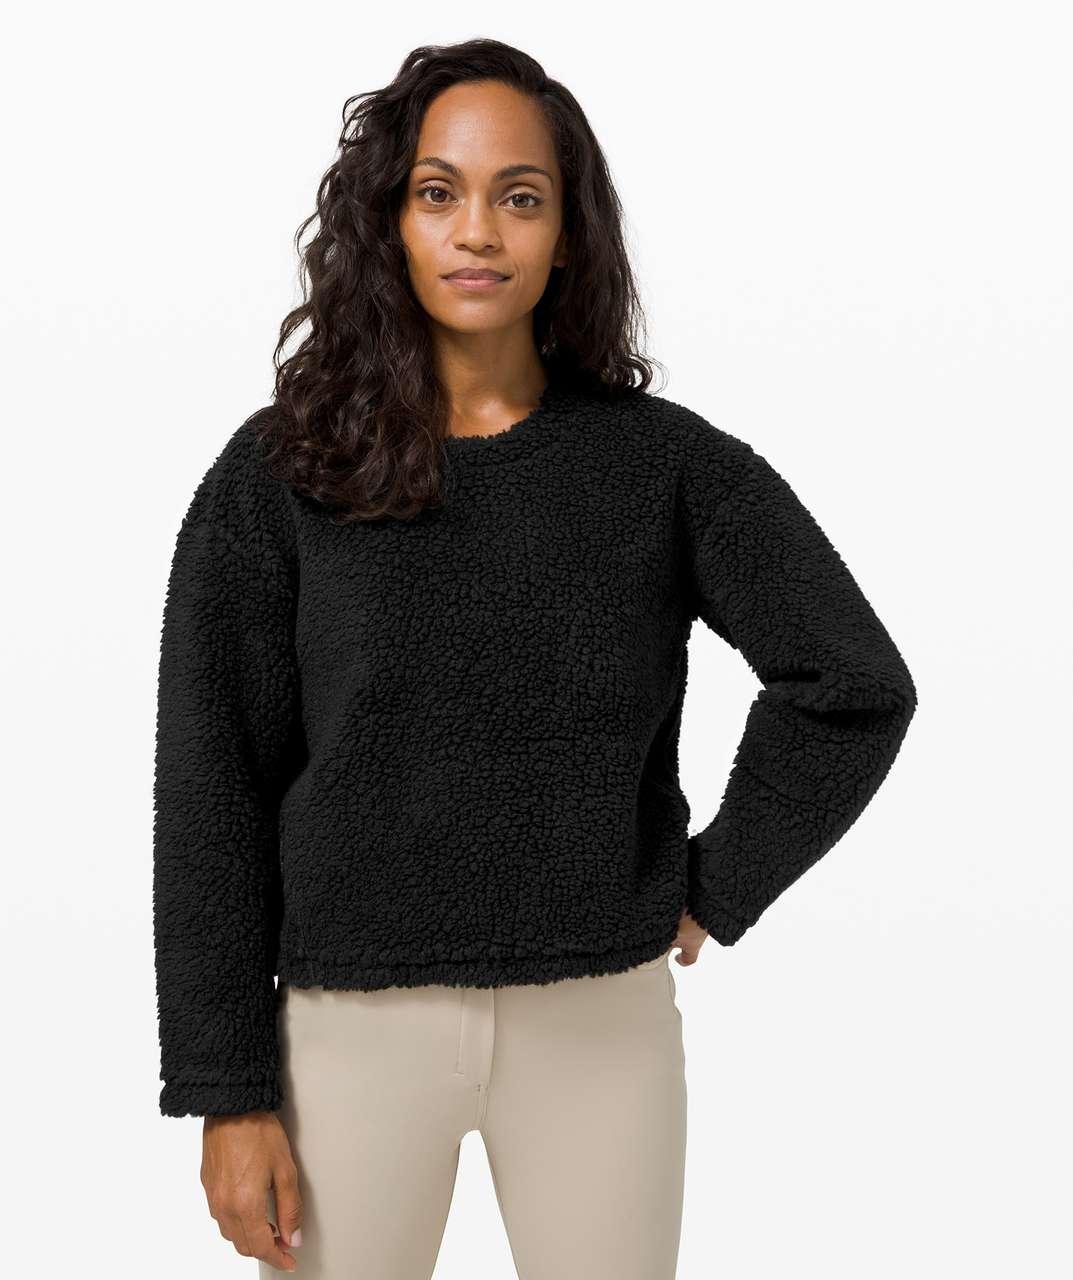 Lululemon Wool Whenever Crew - Black